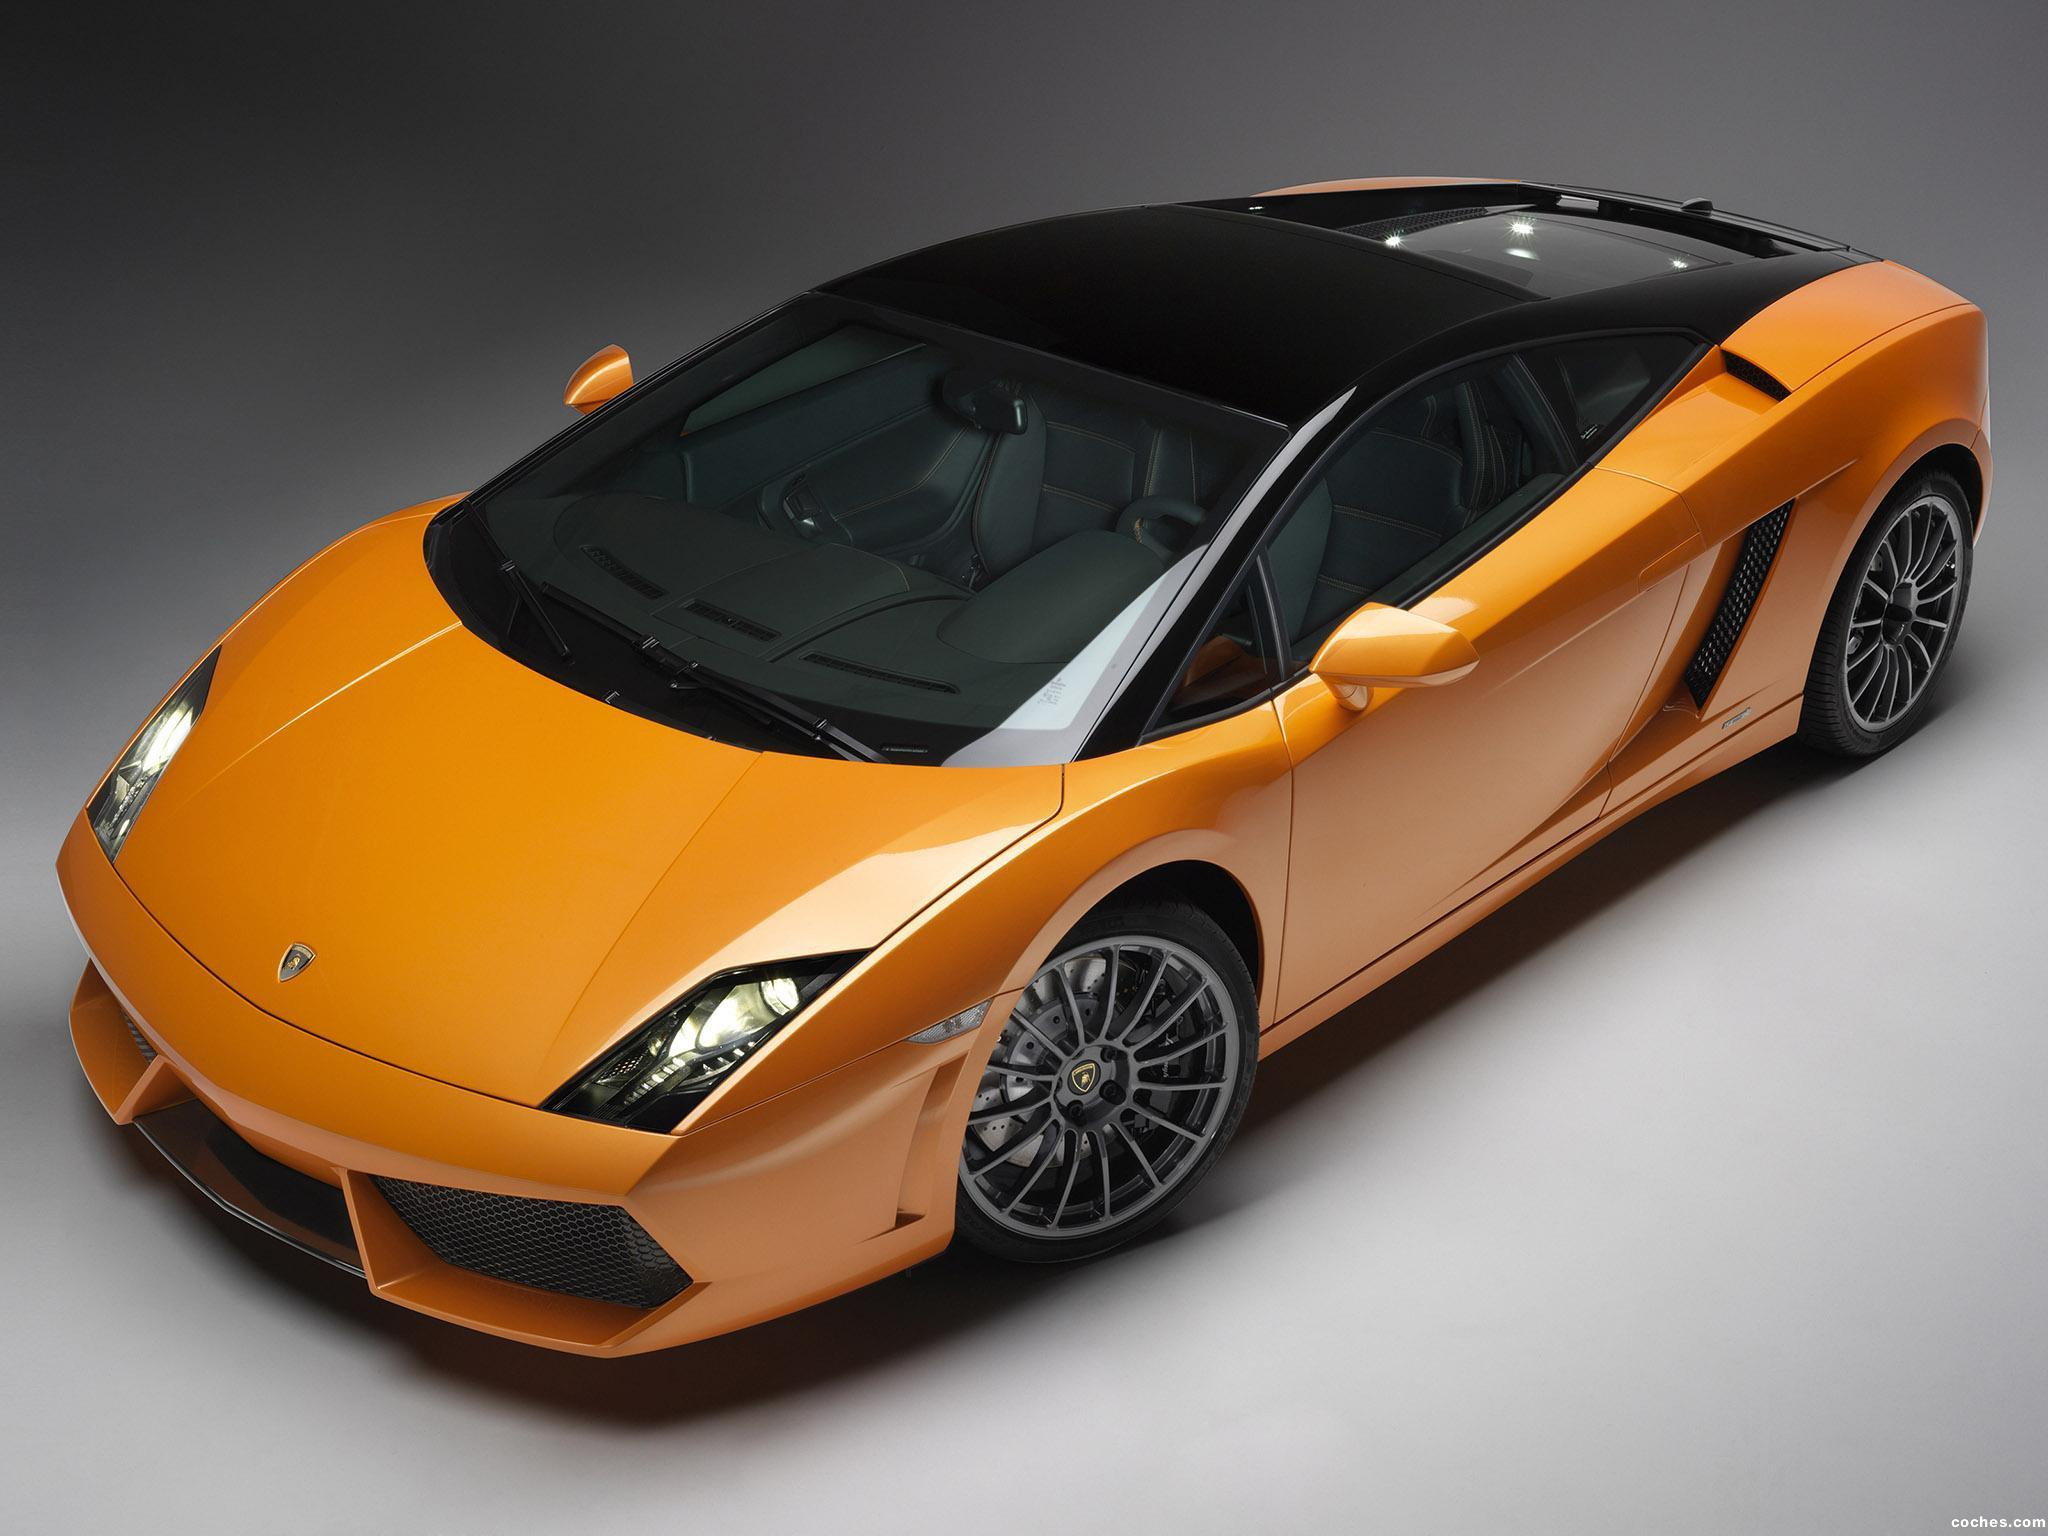 Foto 0 de Lamborghini Gallardo LP 560-4 Bicolore 2011